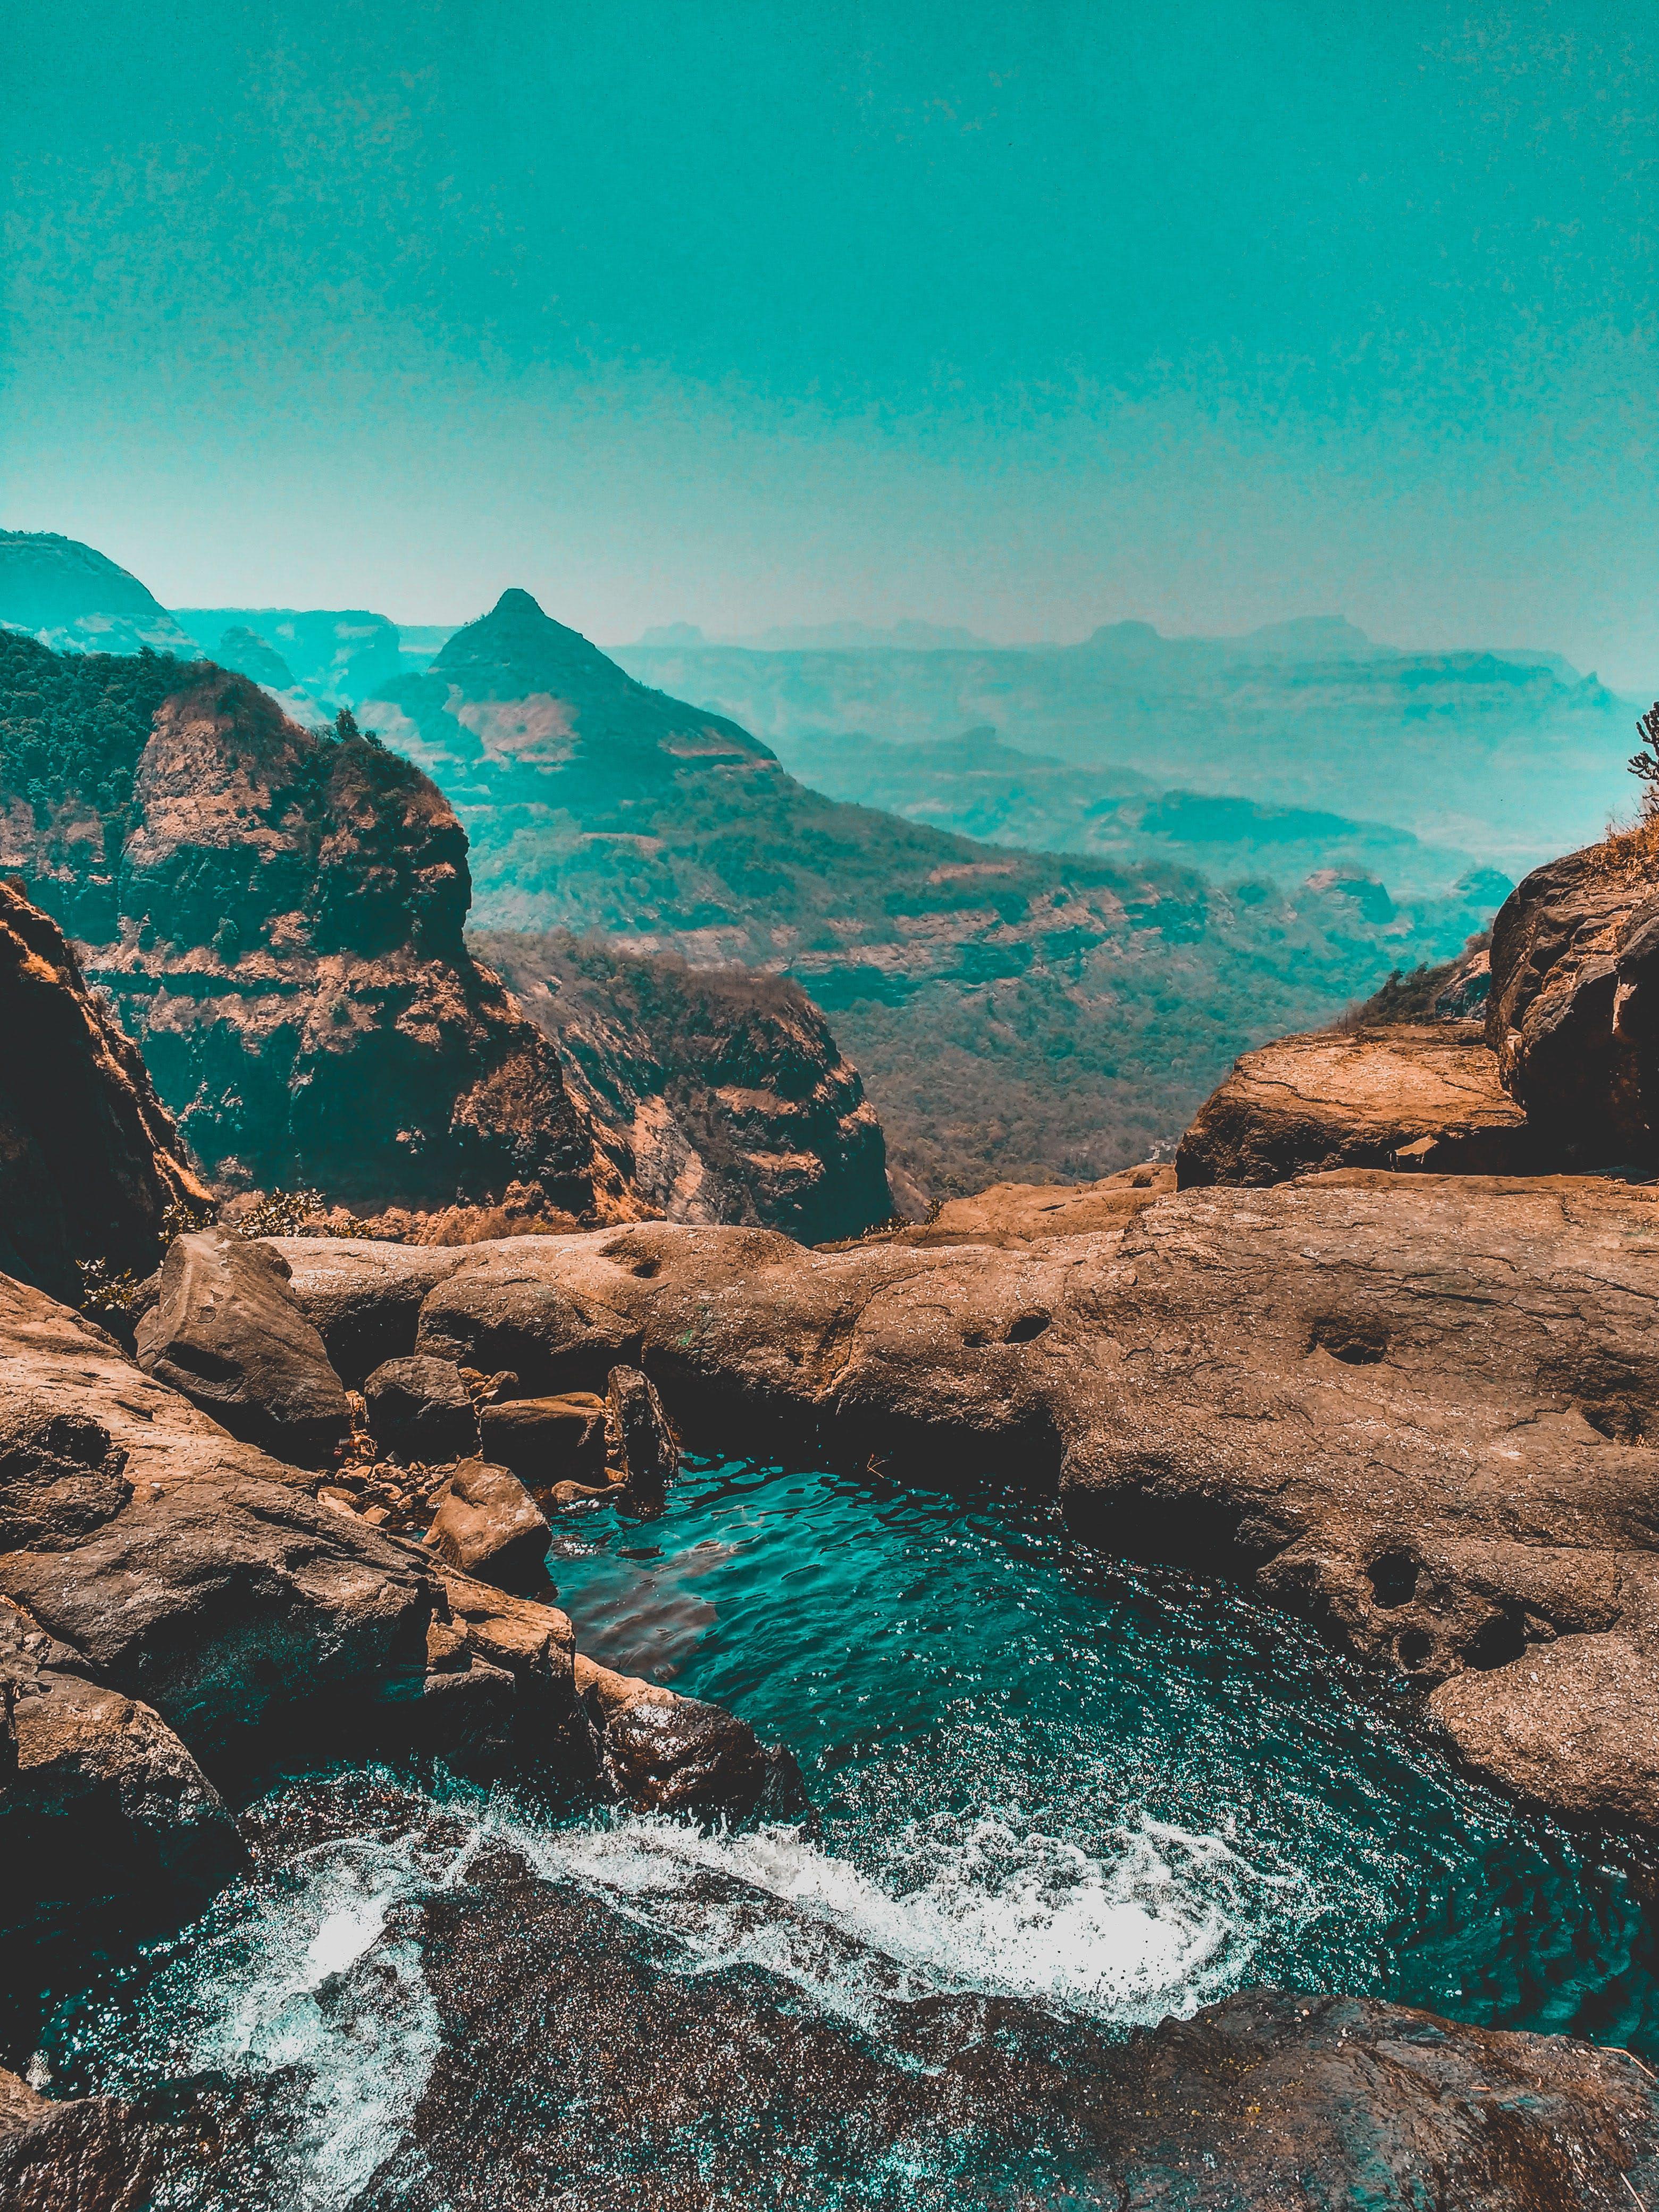 Fotos de stock gratuitas de agua, cascadas, caudal, cielo